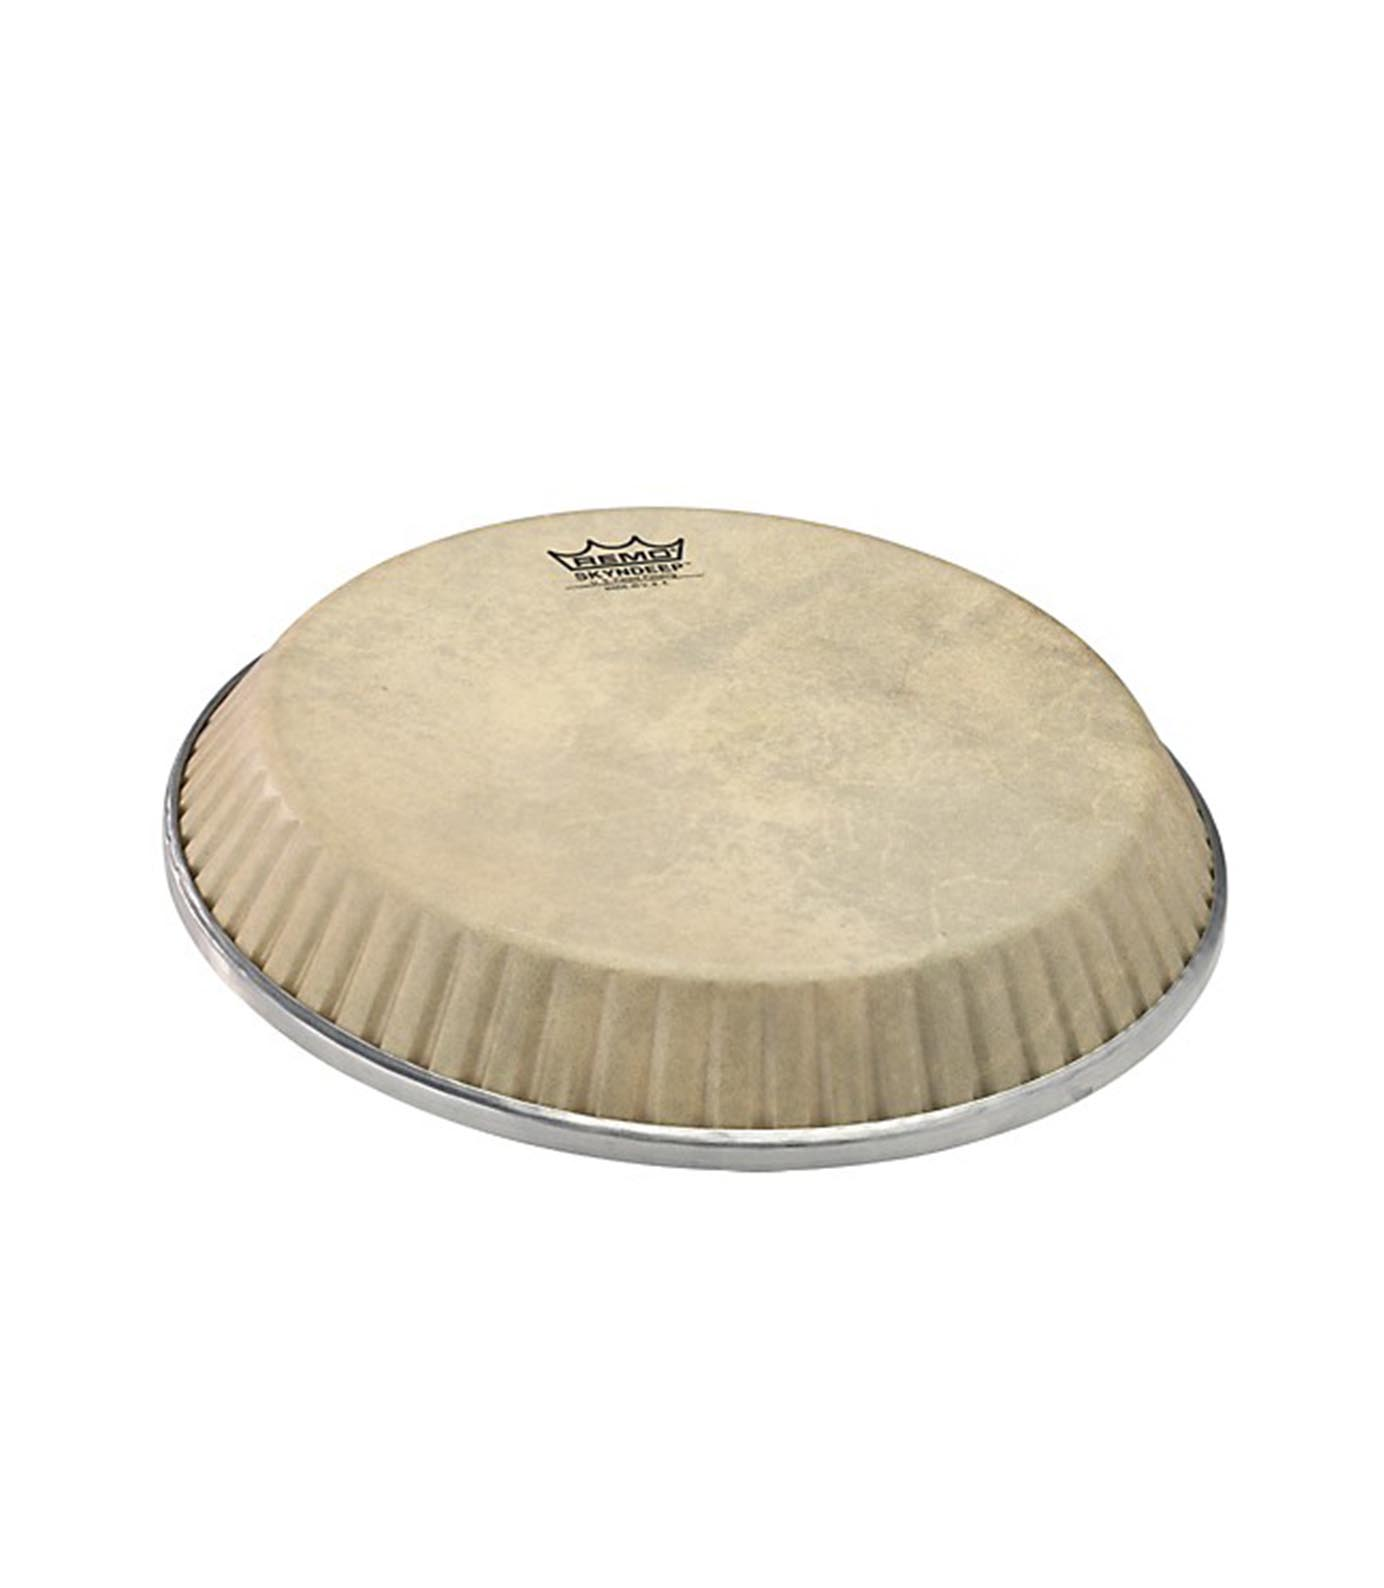 buy remo conga drumhead symmetry 9 75 d4 skyndeep ca